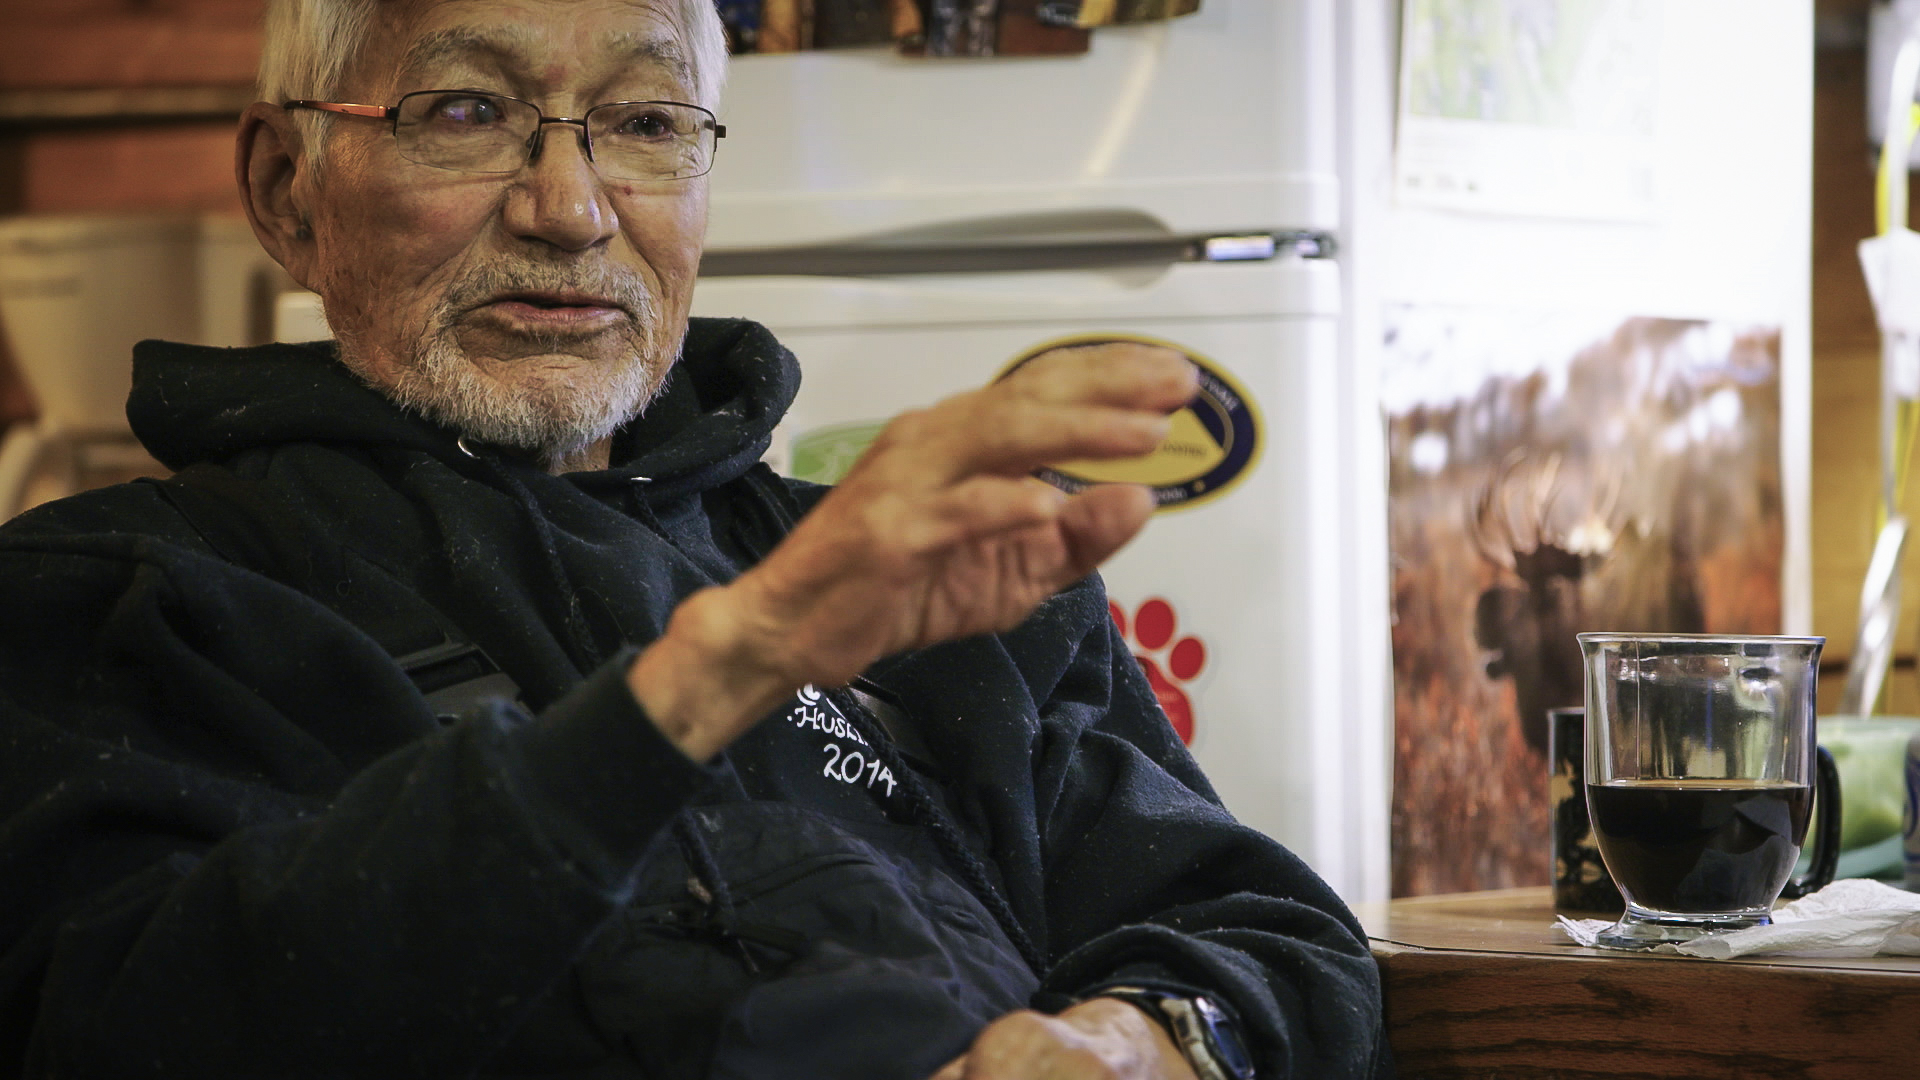 George Attla coaching his grandnephew on the tricks to training a 16-dog sled team.